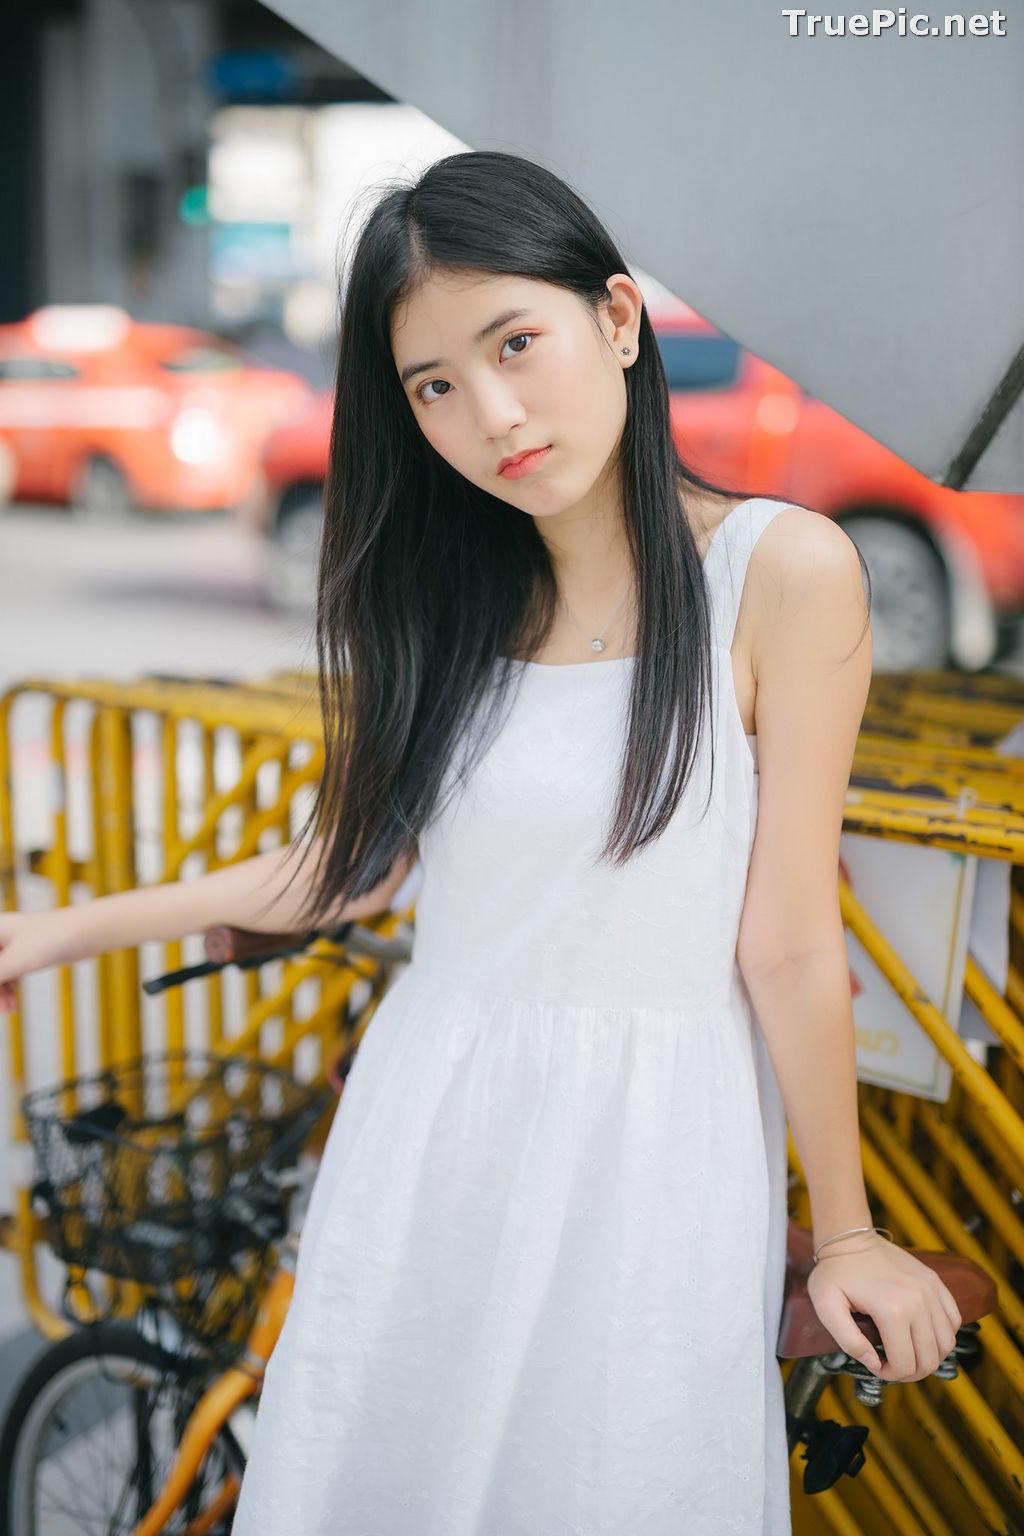 Image Thailand Model - Venita Loywattanakul - A Beautiful White - TruePic.net - Picture-9